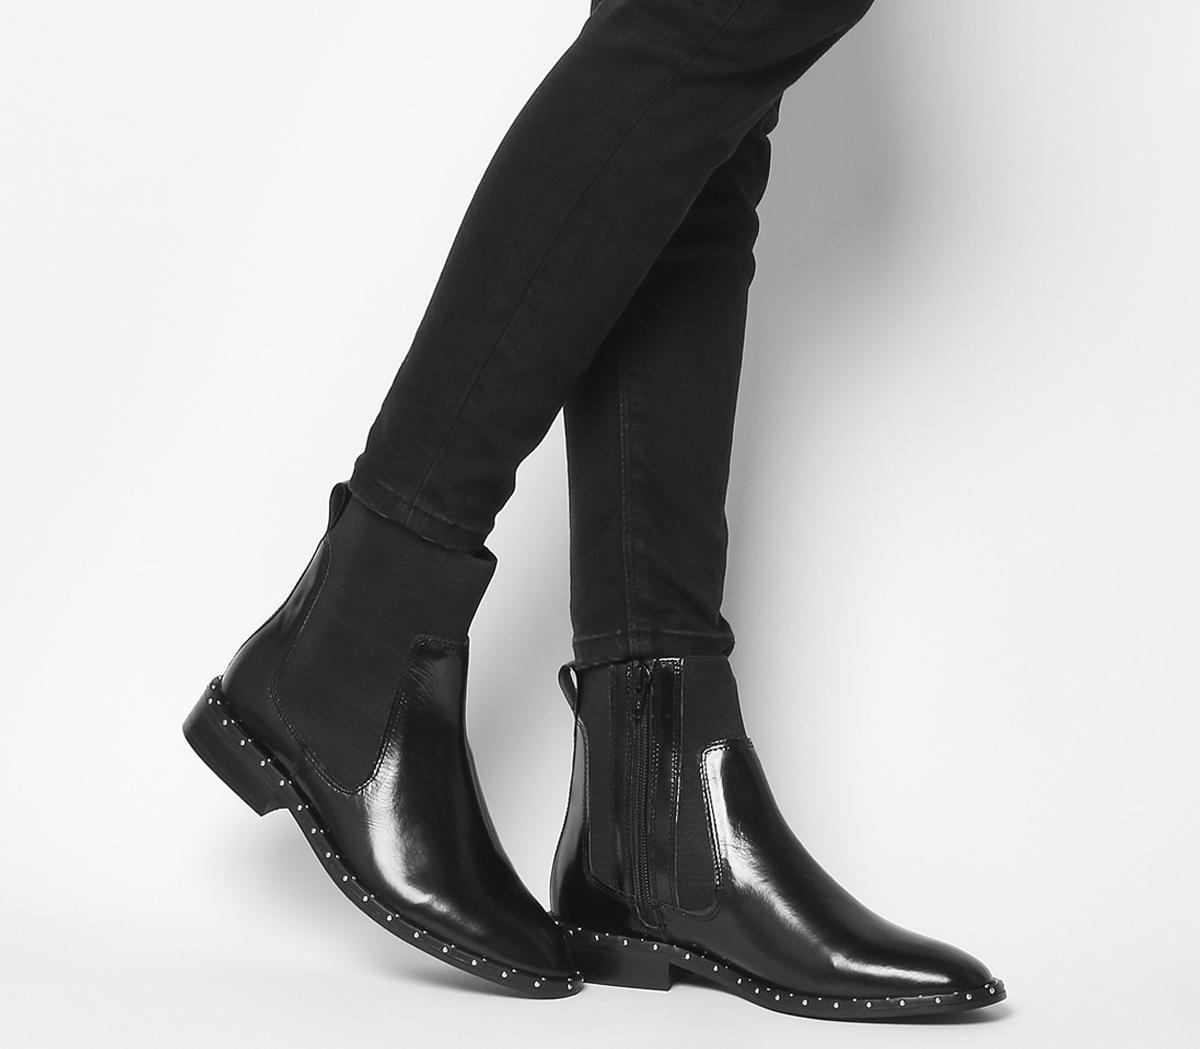 Axel High Cut Stud Chelsea Boots